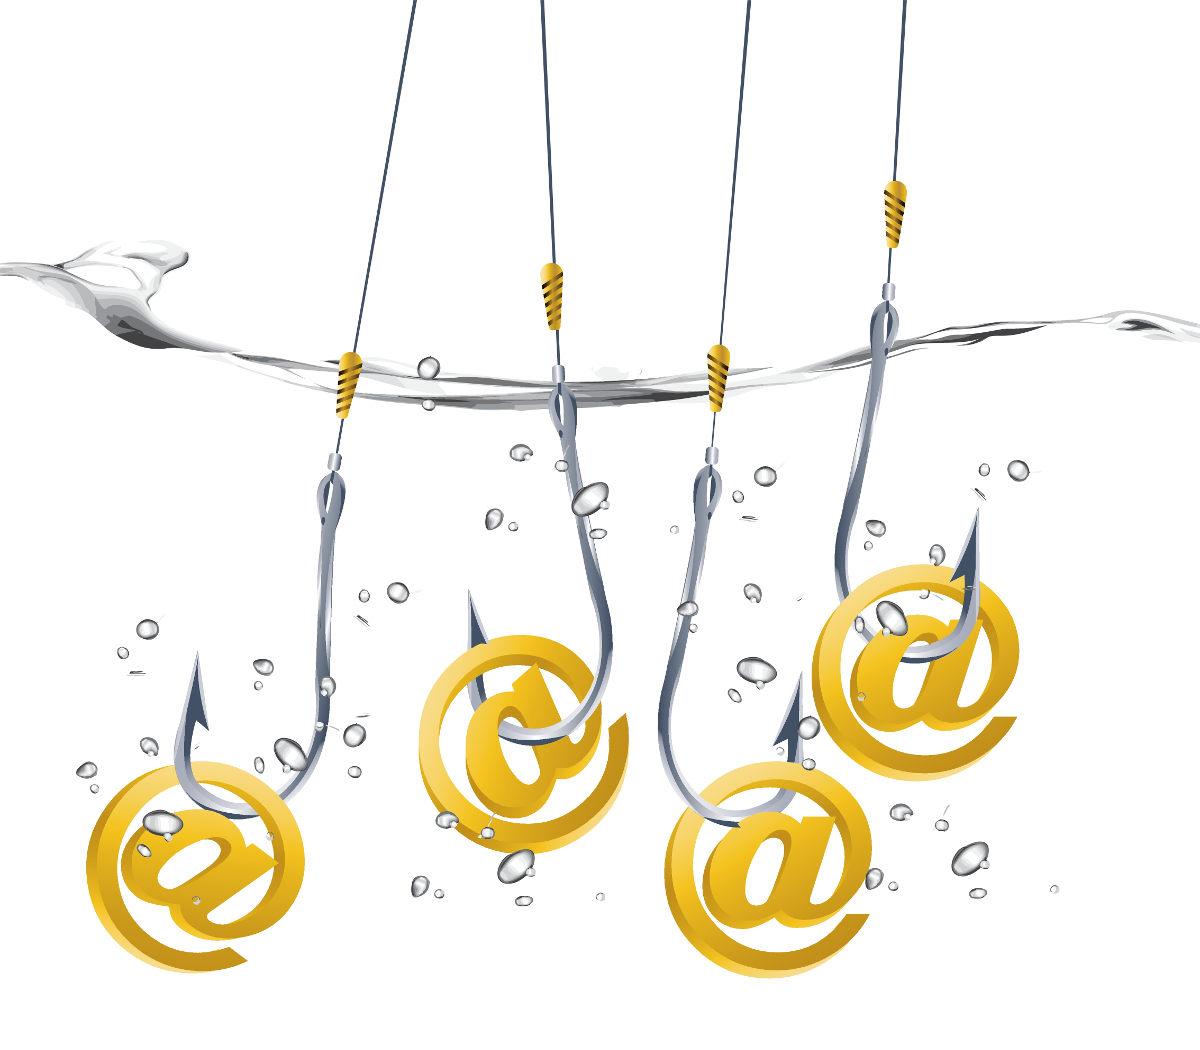 Mail truffa come proteggersi dal Phishing